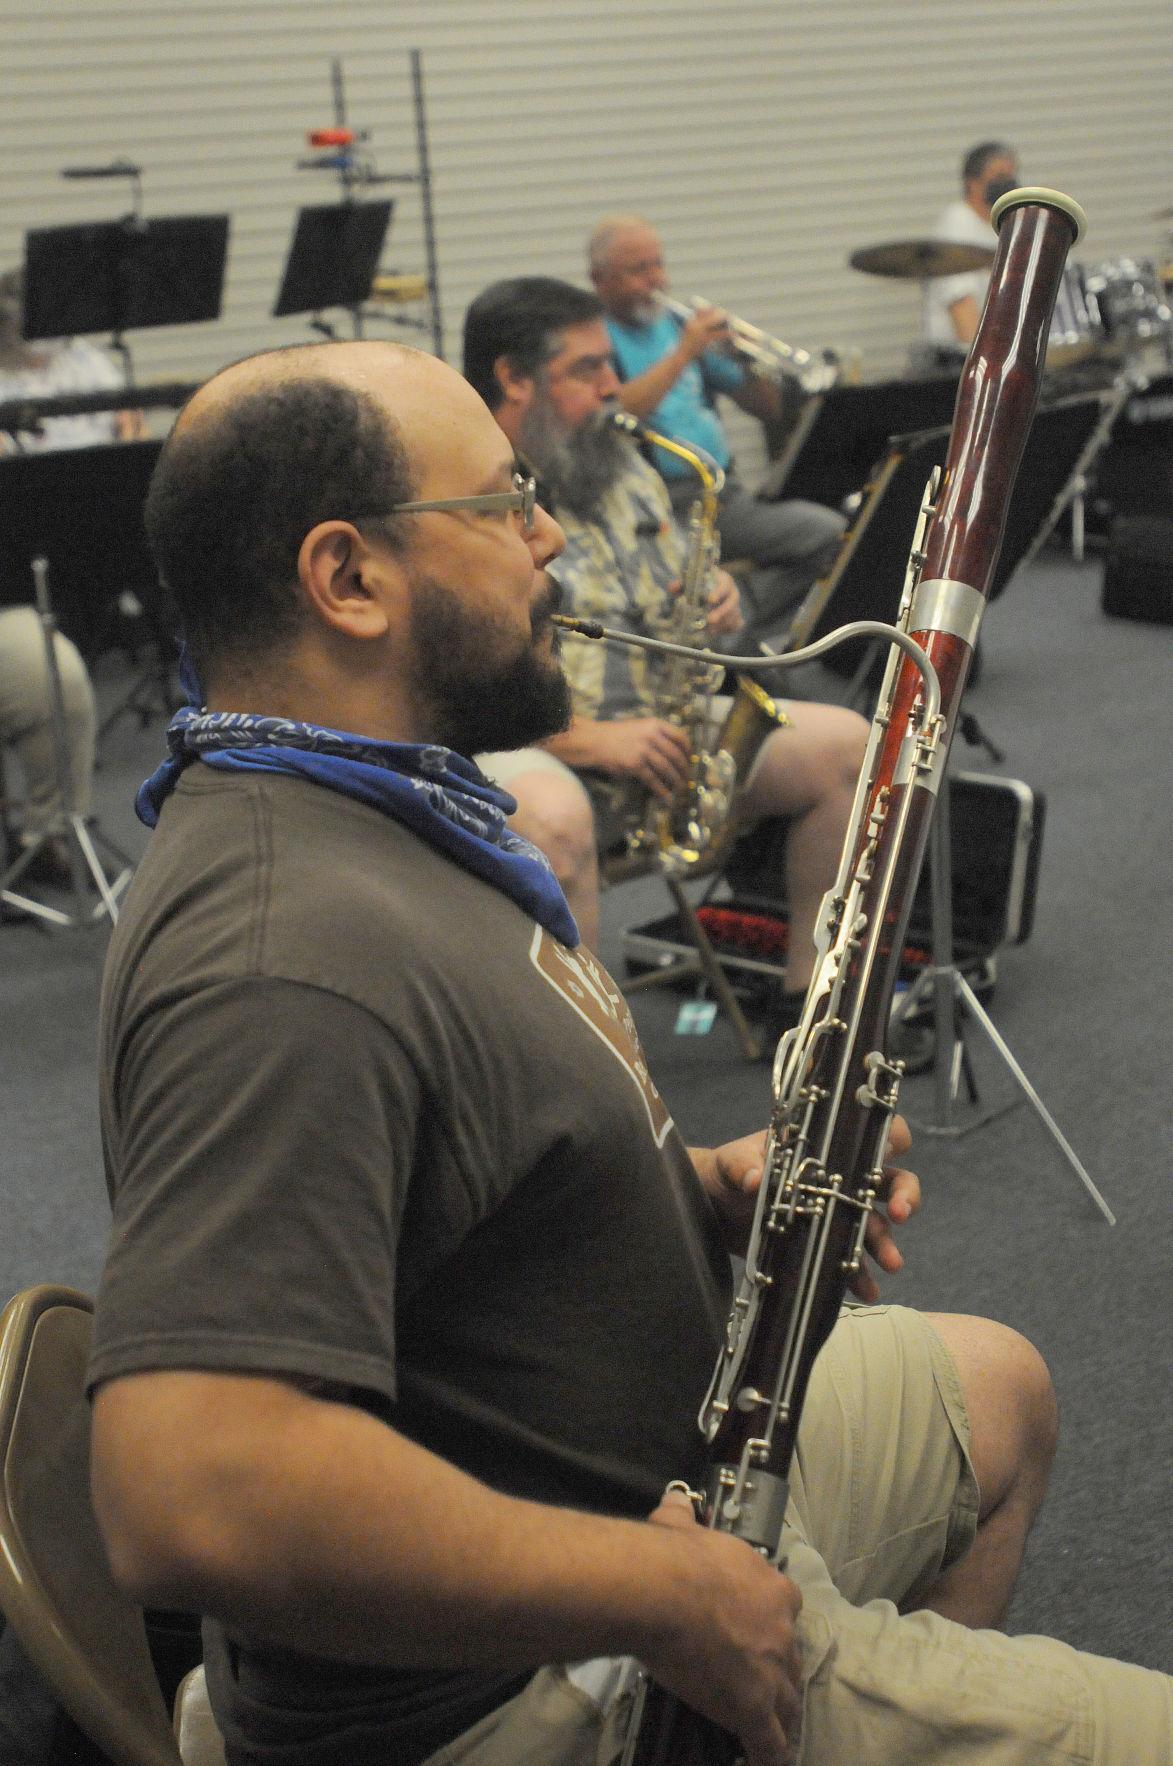 Band bassoon